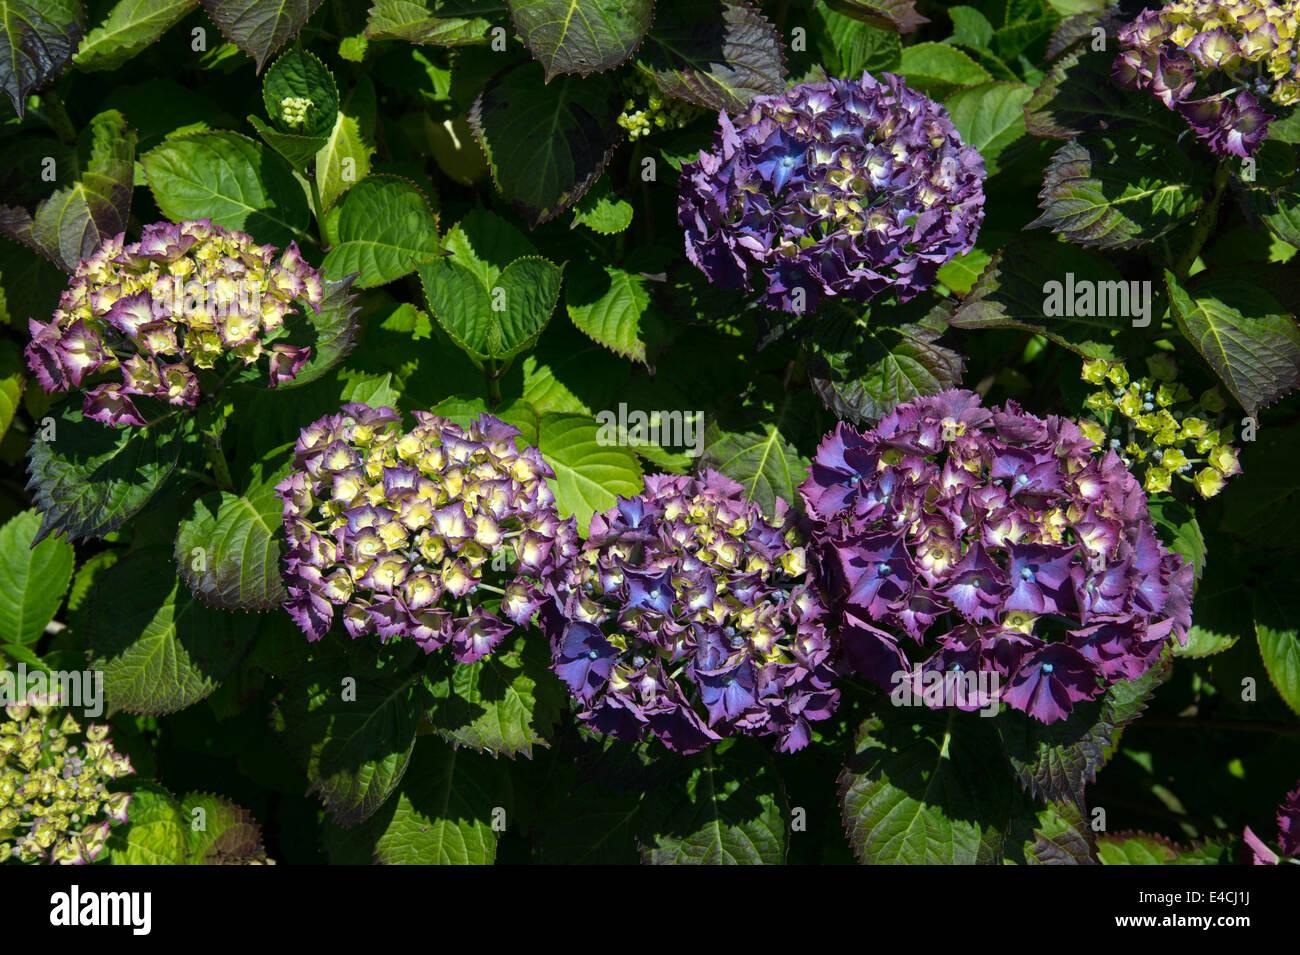 Cornwall. La péninsule de Roseland. St Mawes . Hortensias violets. Photo Stock